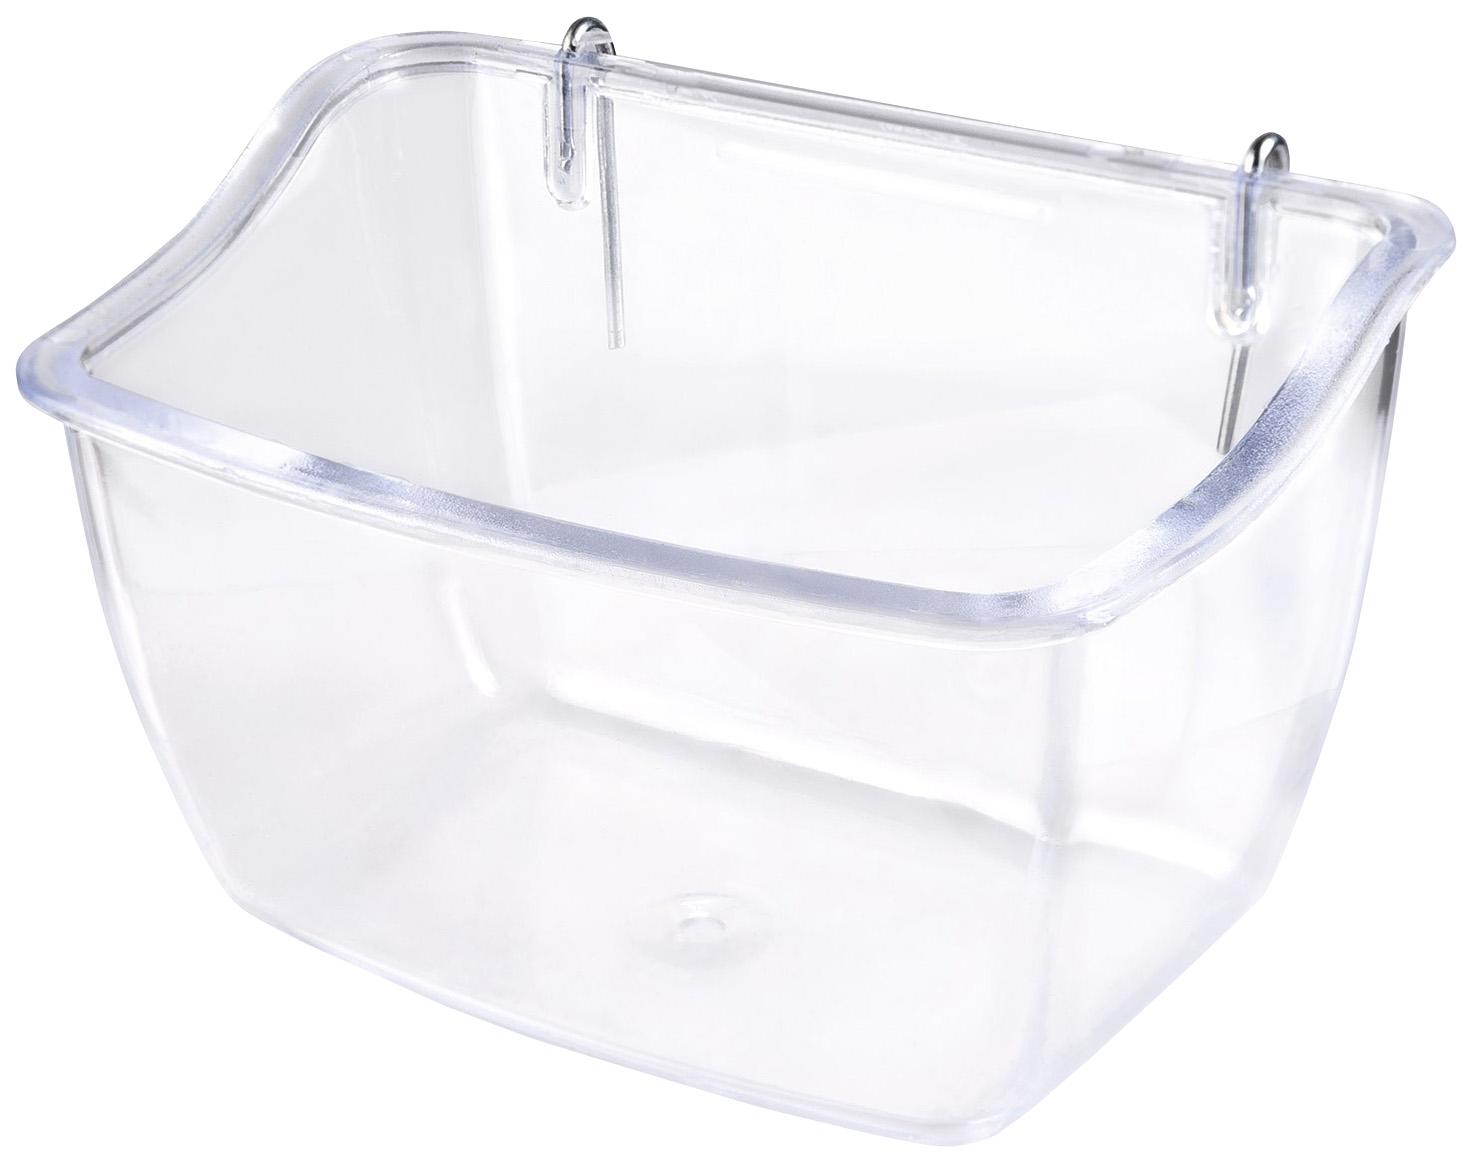 Кормушка для птиц IMAC, пластик, прозрачный 11х7,5х7